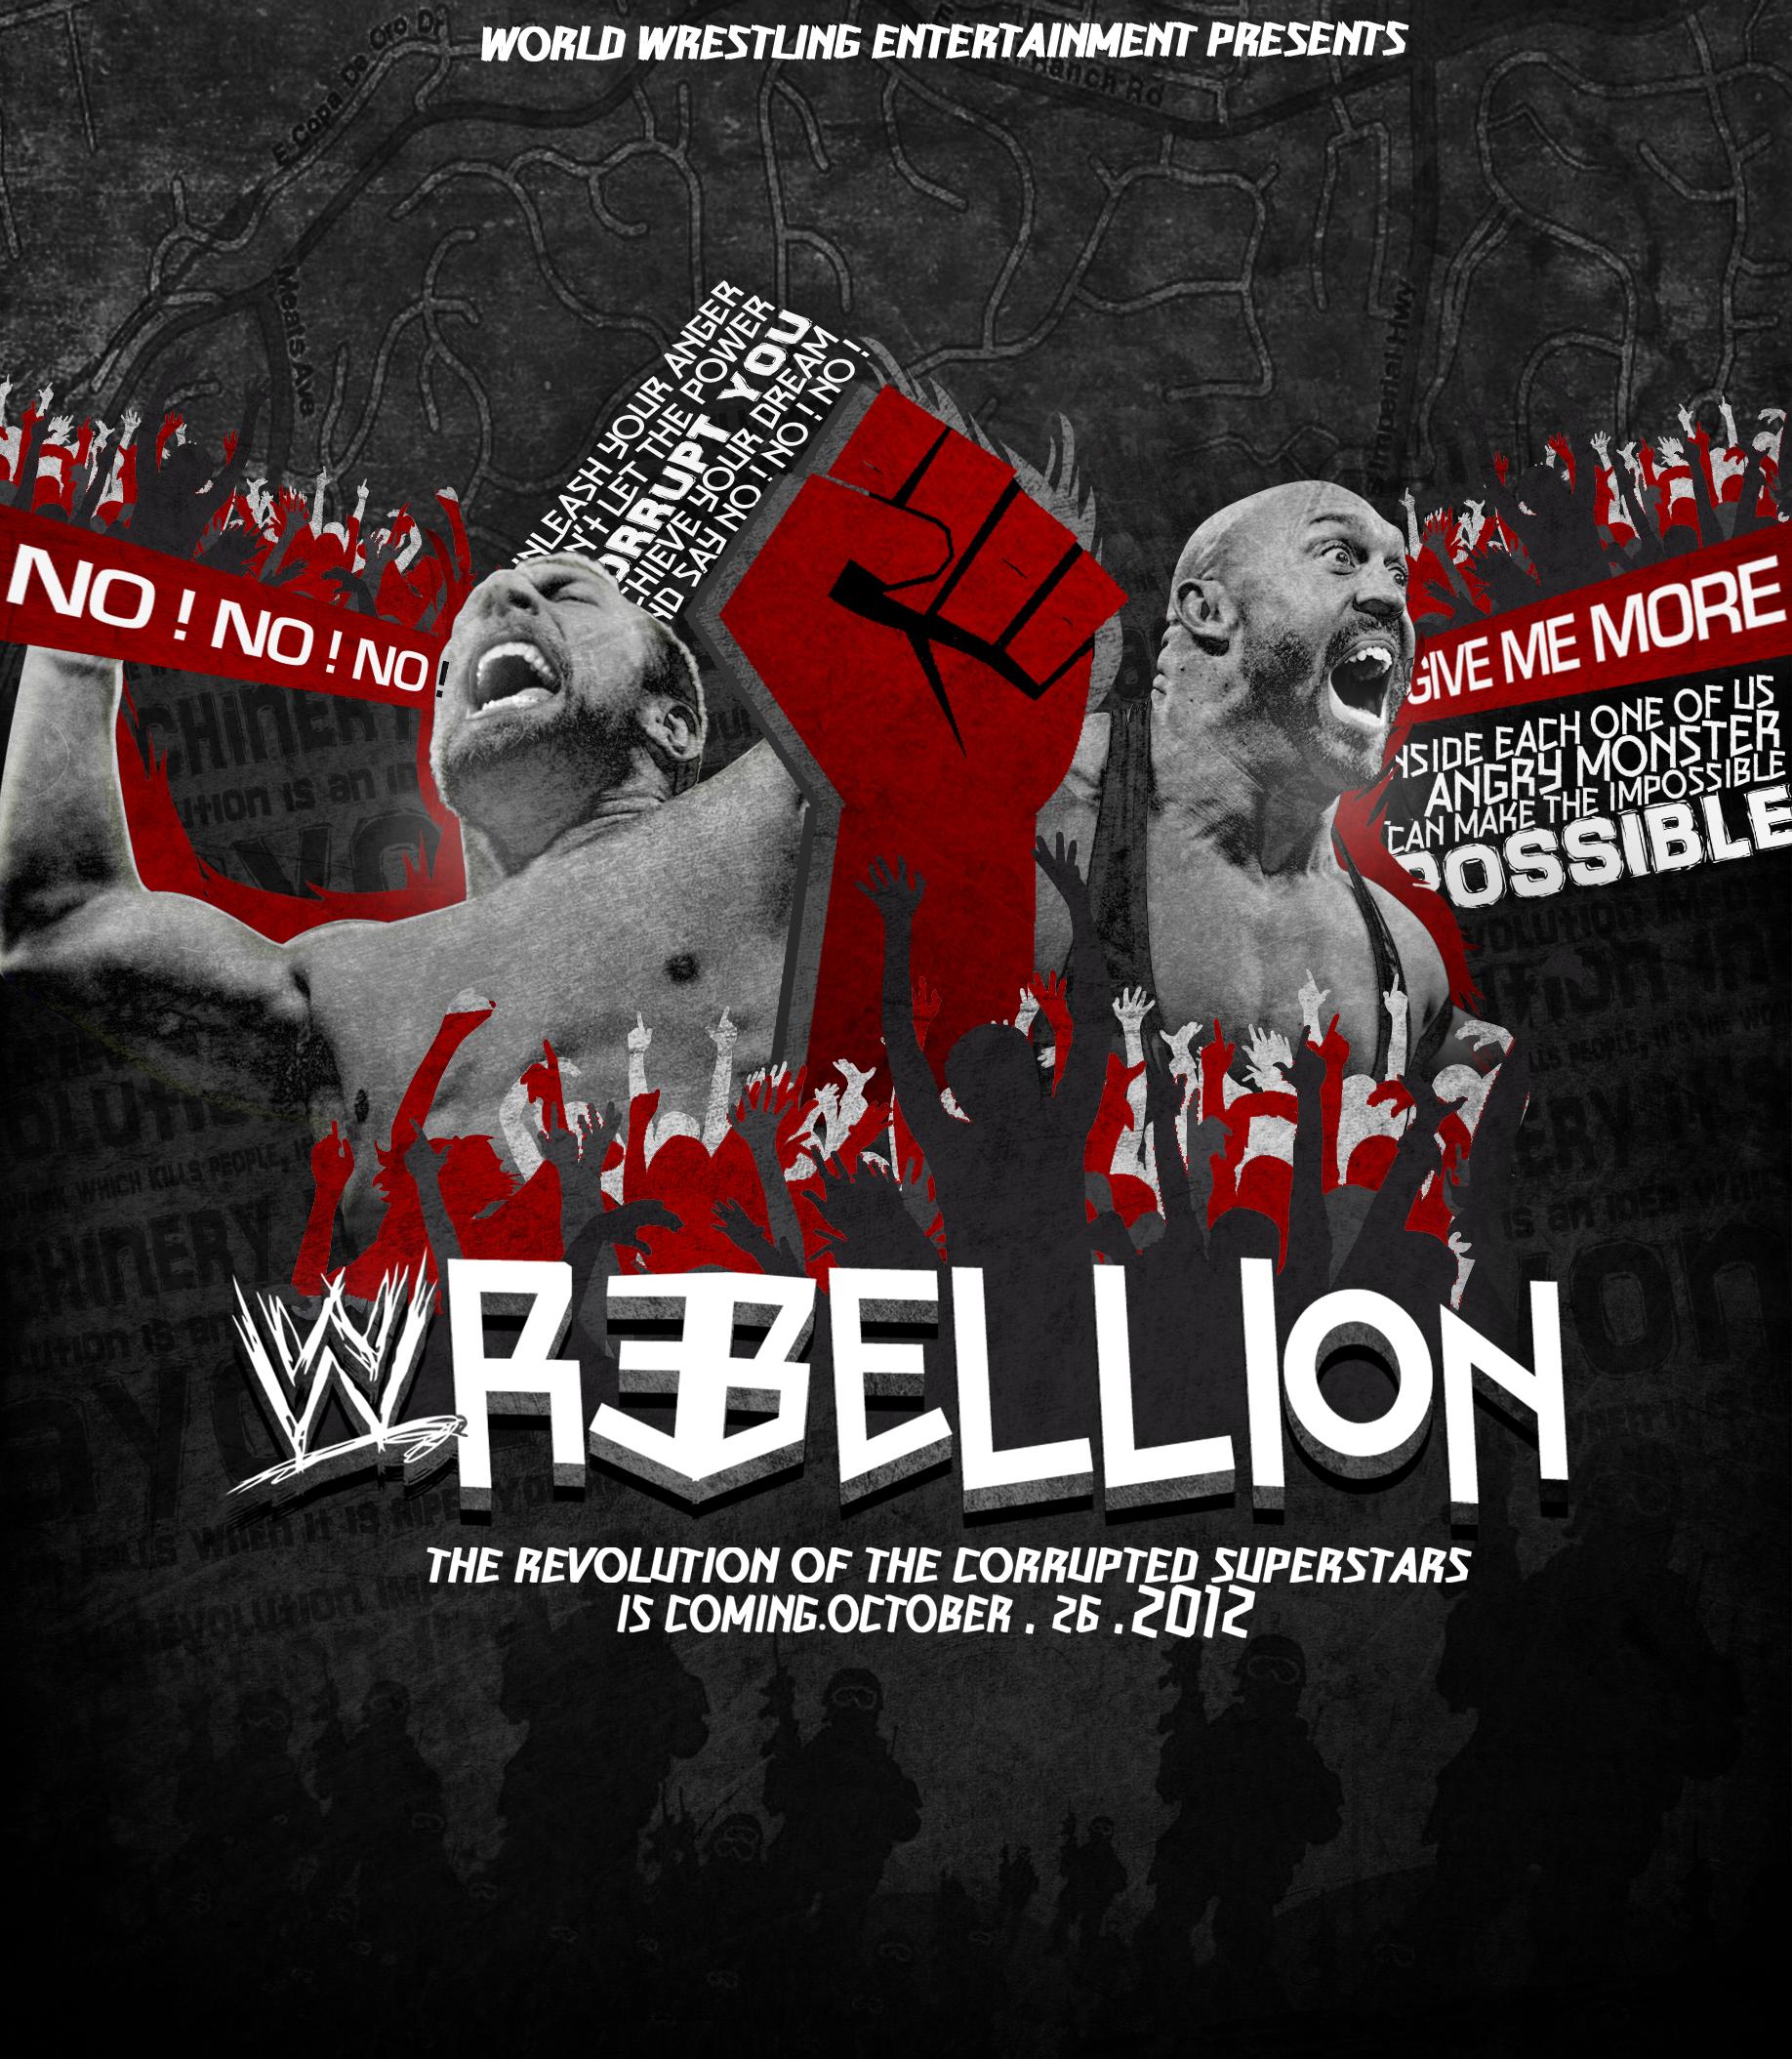 http://fc09.deviantart.net/fs71/f/2012/245/d/1/wwe_rebellion_2012_poster_by_phillipjackbrooks-d5da80x.png